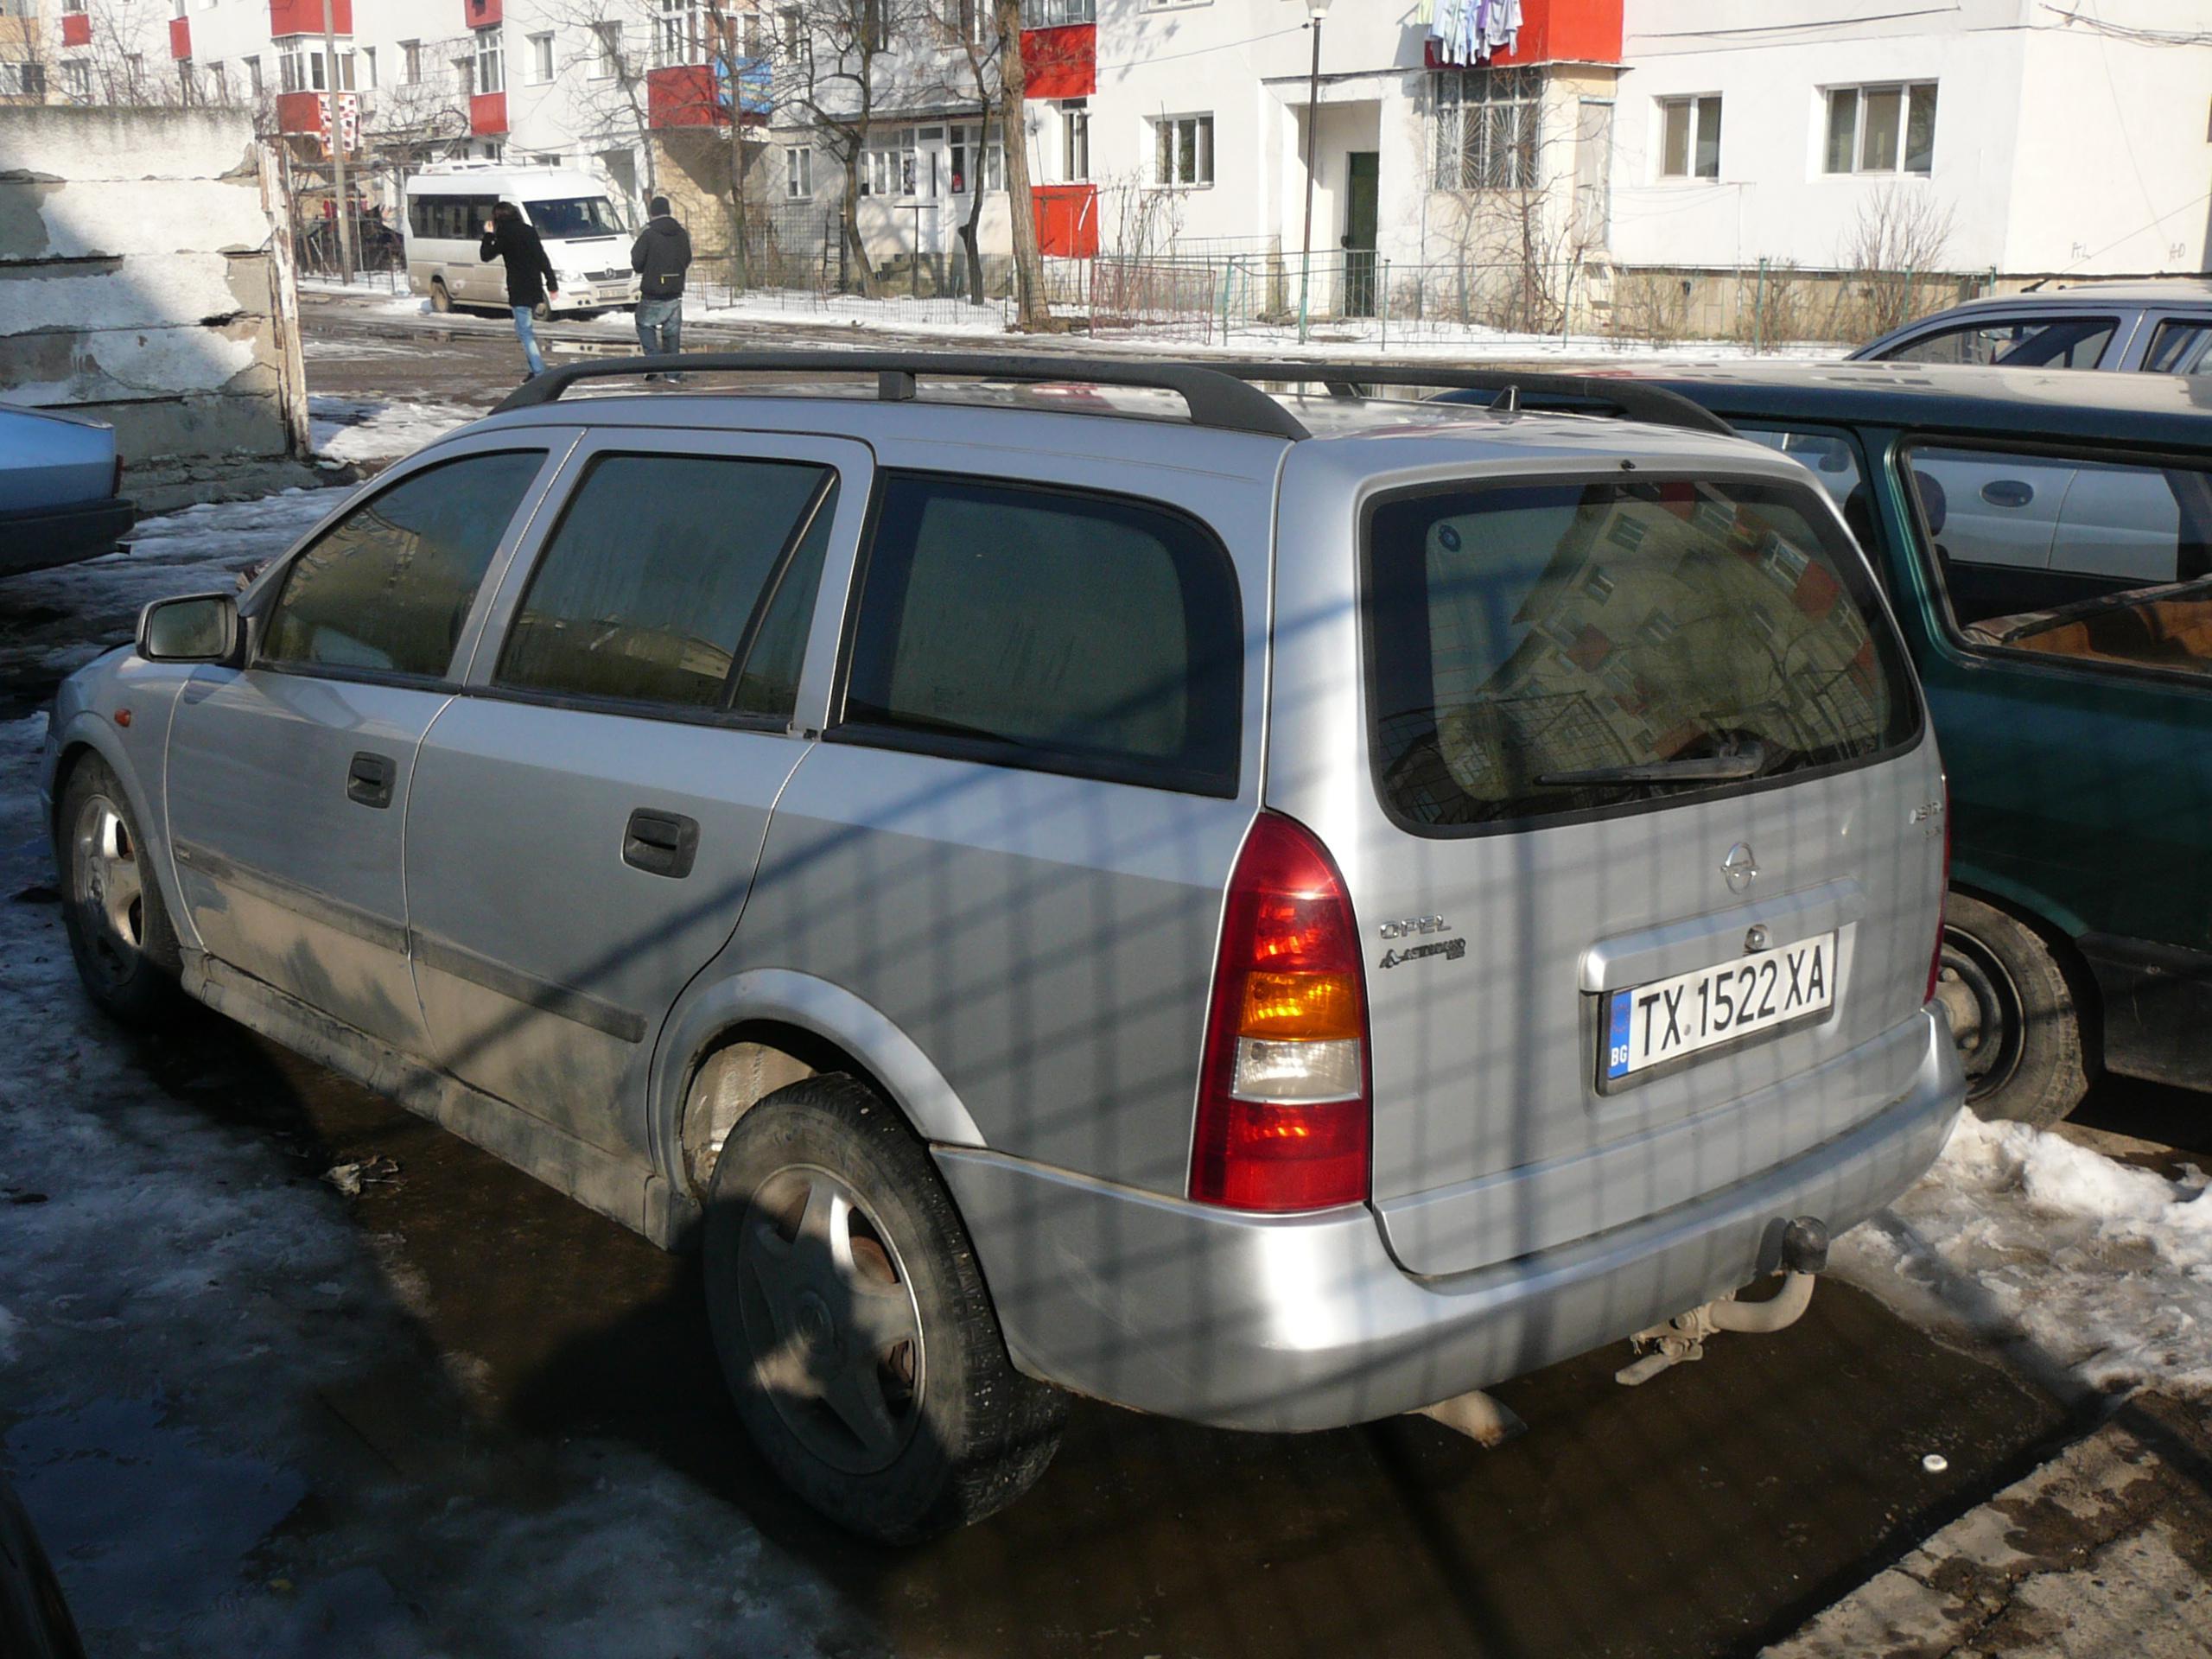 Opel Astra-G avariat 1998 Diesel Hatchback - 06 Martie 2011 - Poza 1